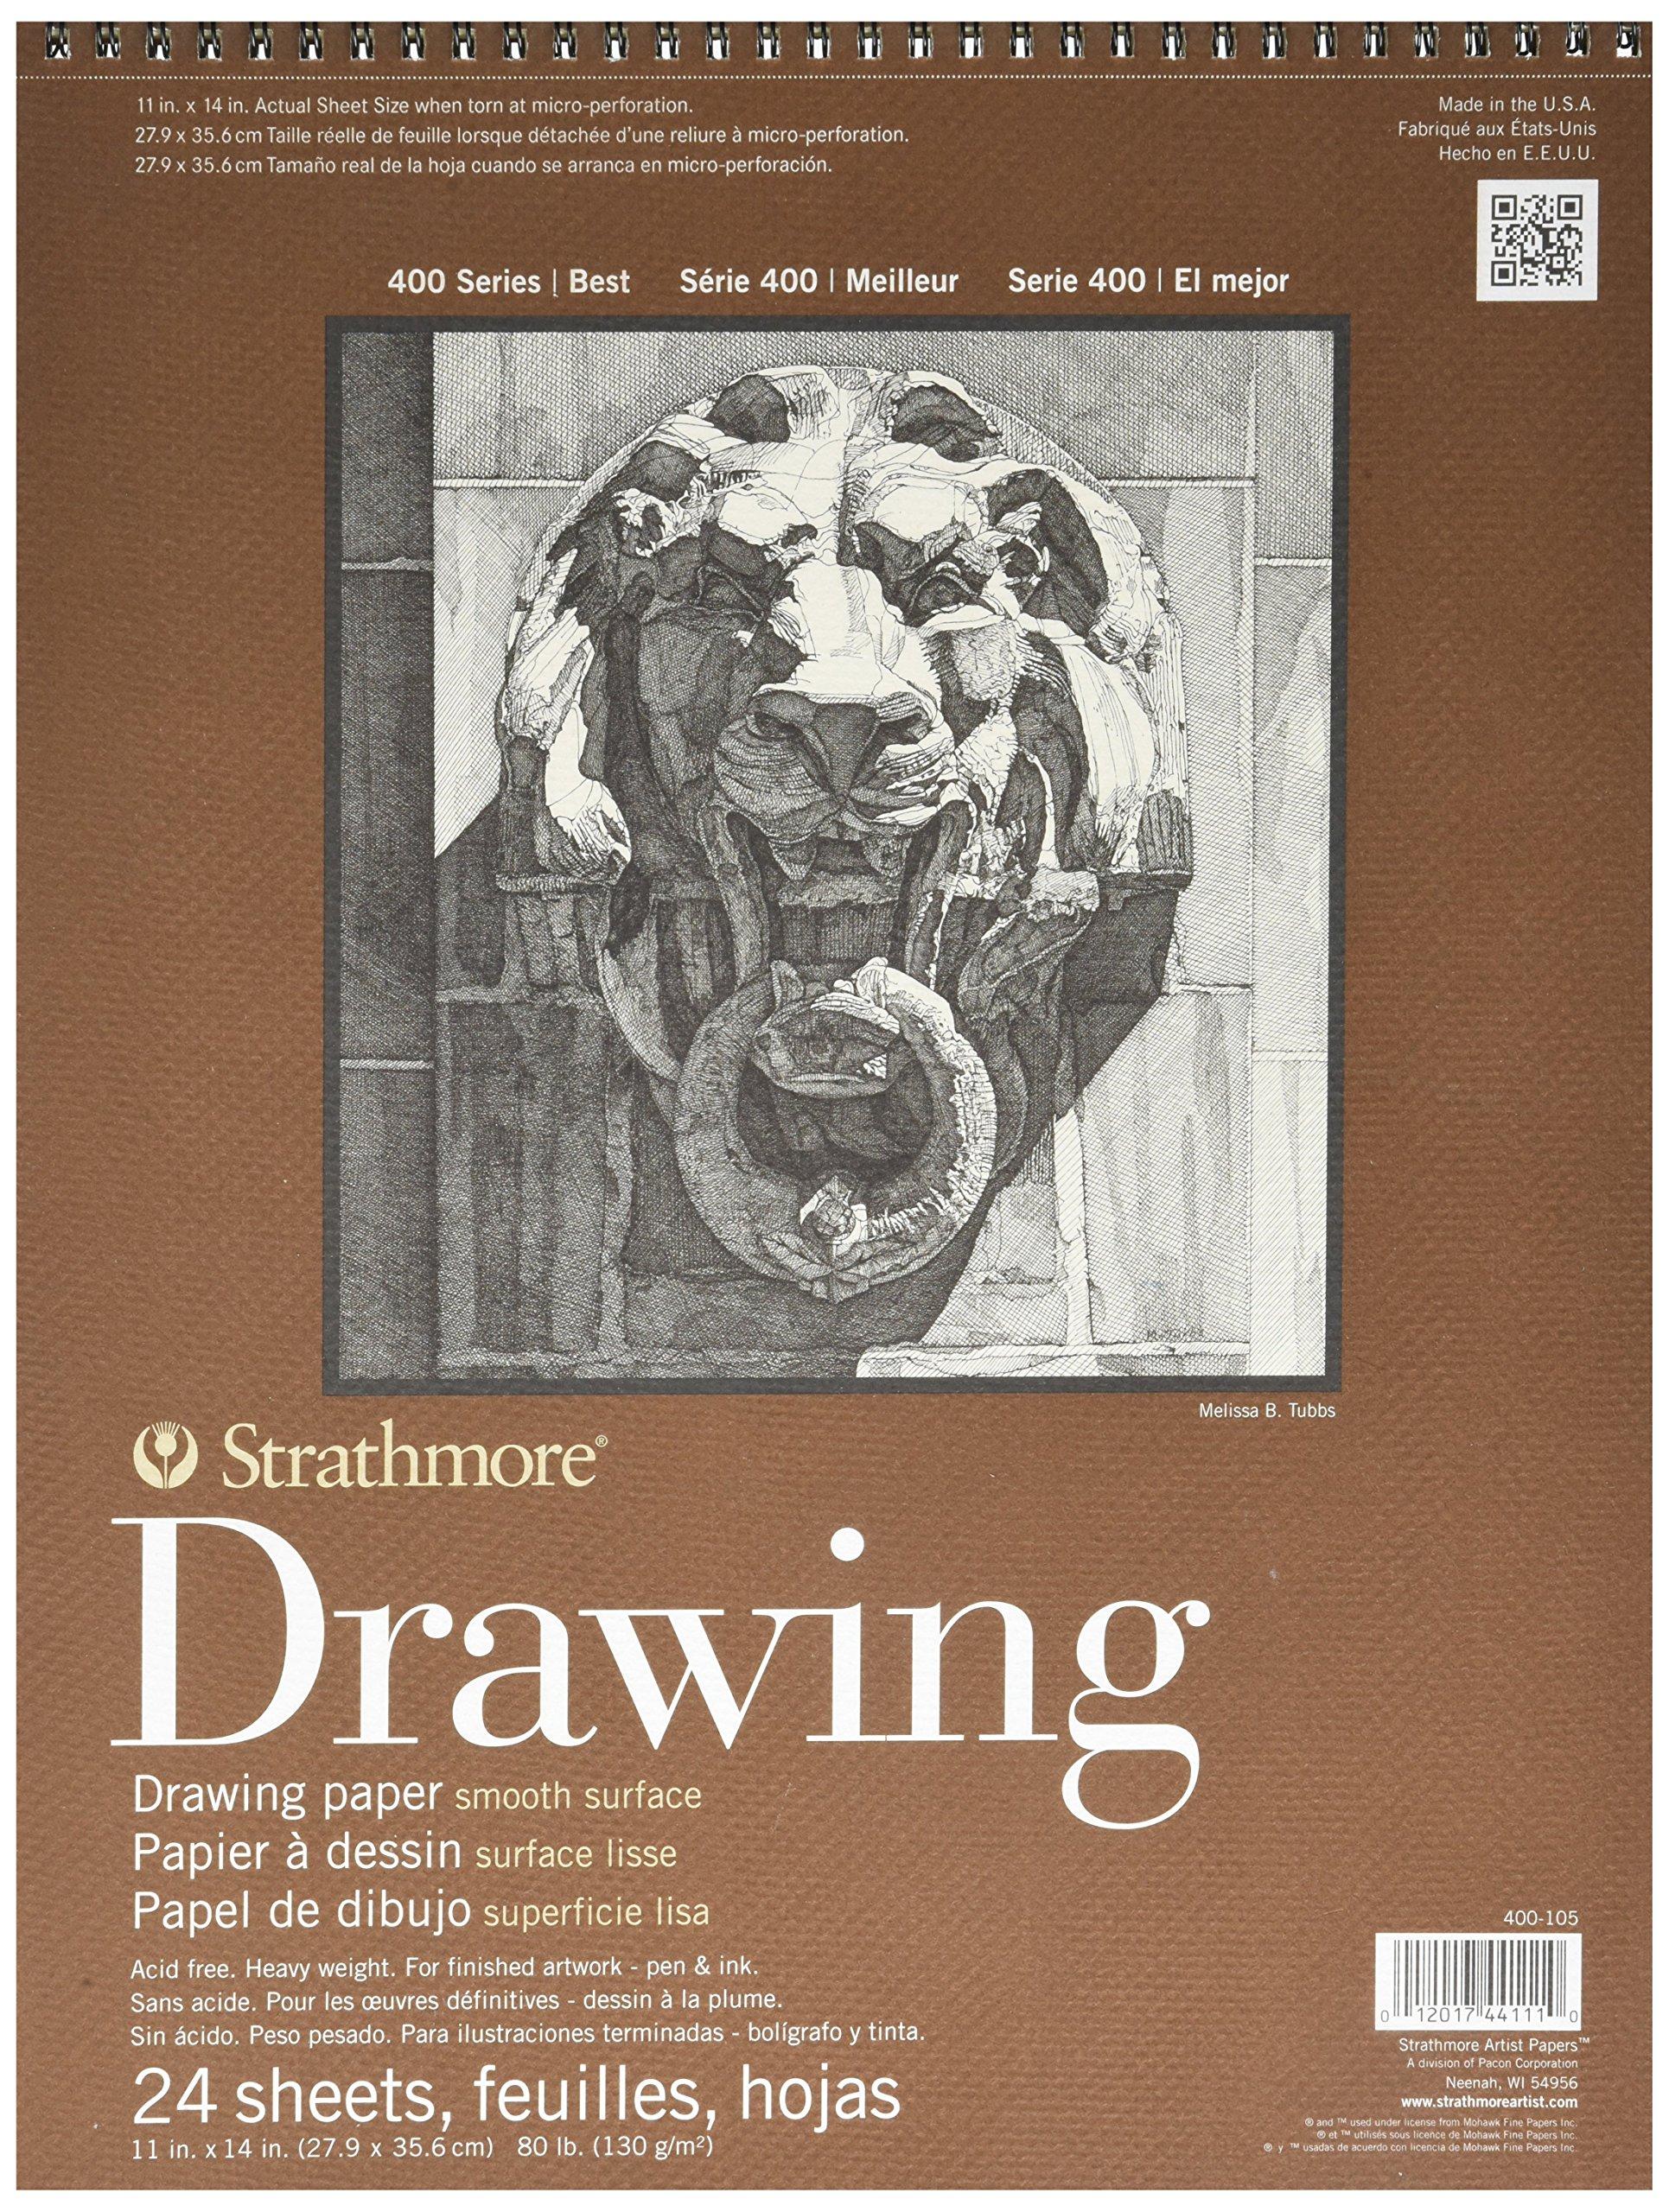 Cuaderno De Dibujo 24 Hojas Strathmore 400 Series 28x35.6cm